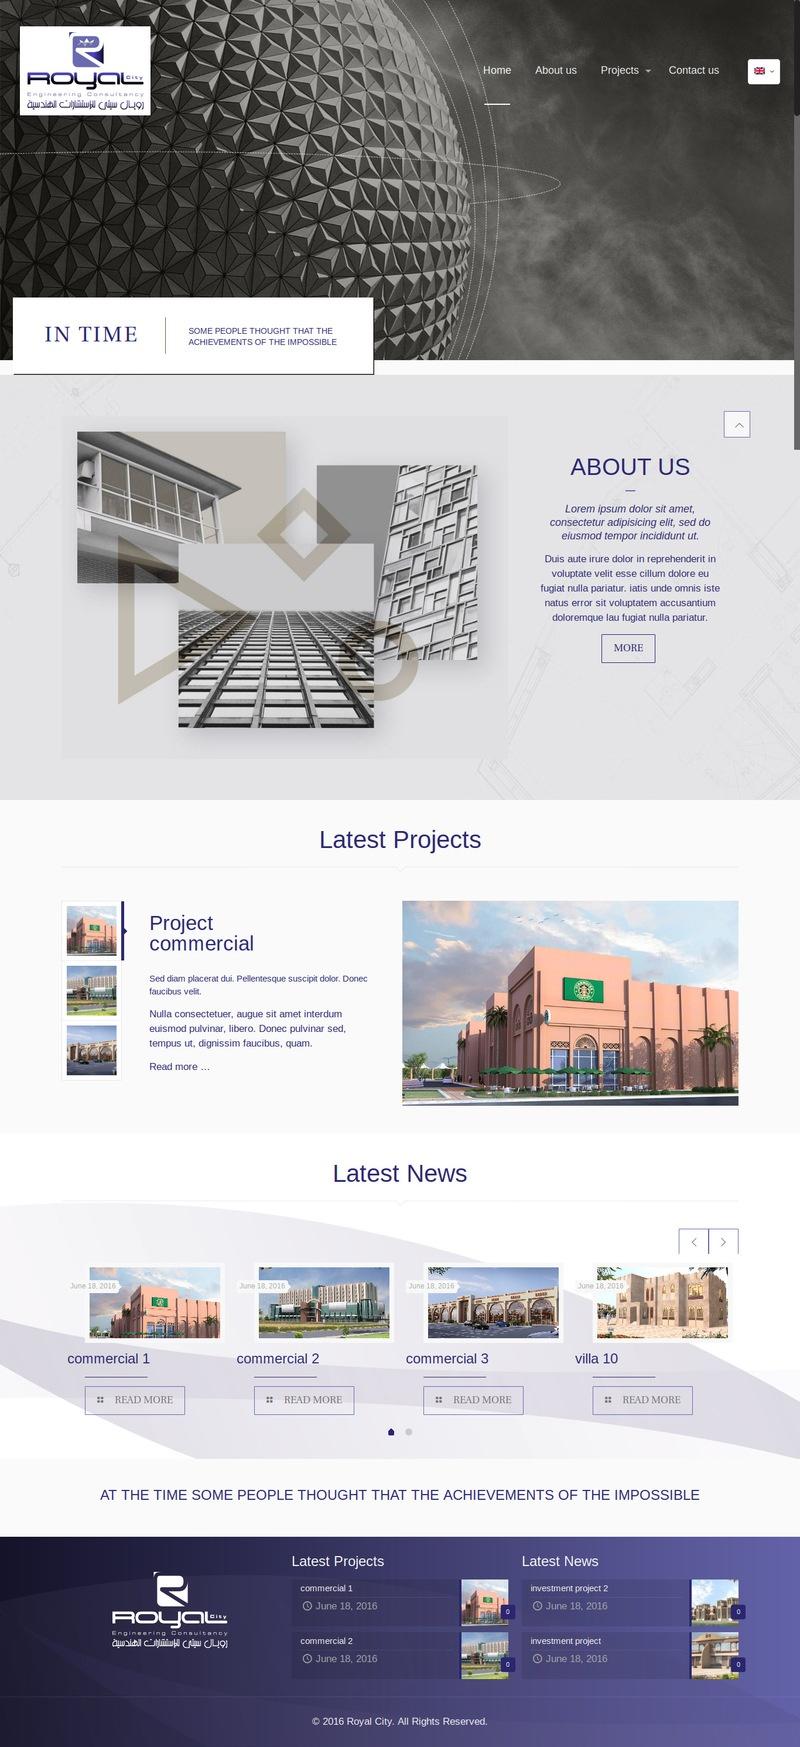 waleed-sayed-Website Design & Development - Royal City